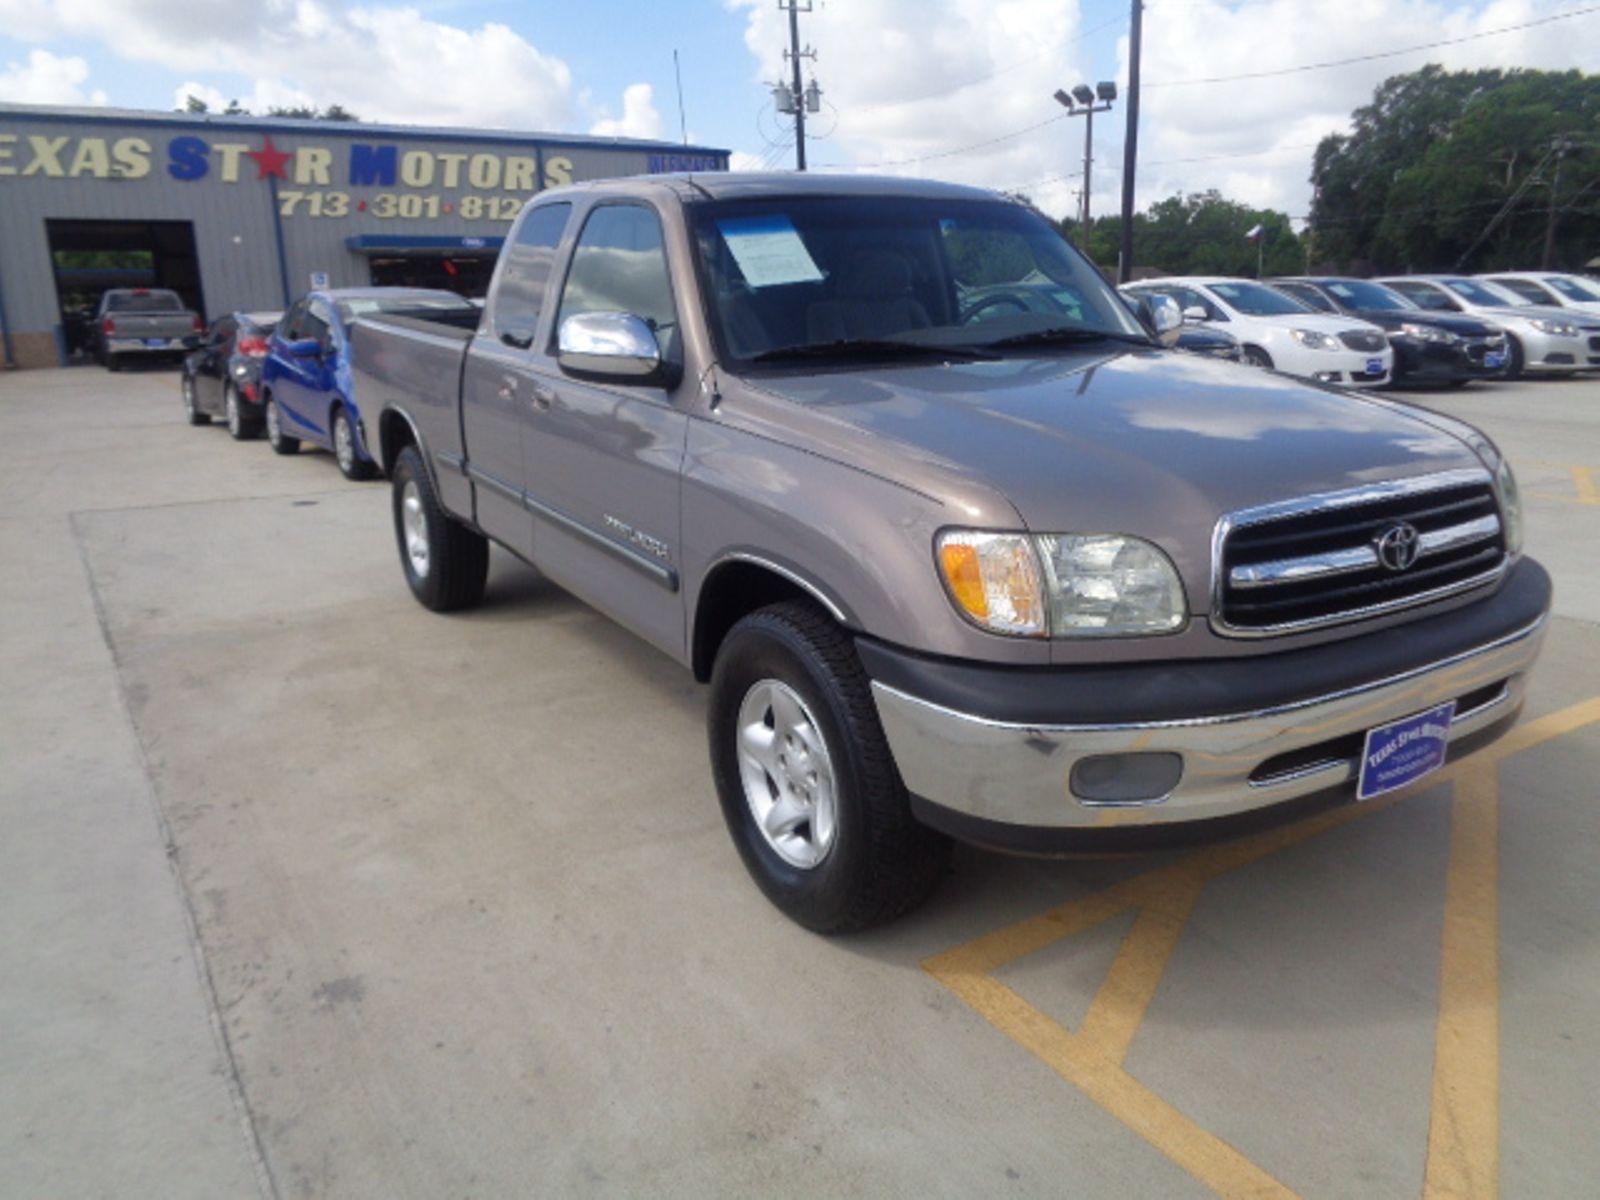 2002 Toyota Tundra SR5 City TX Texas Star Motors In Houston, ...